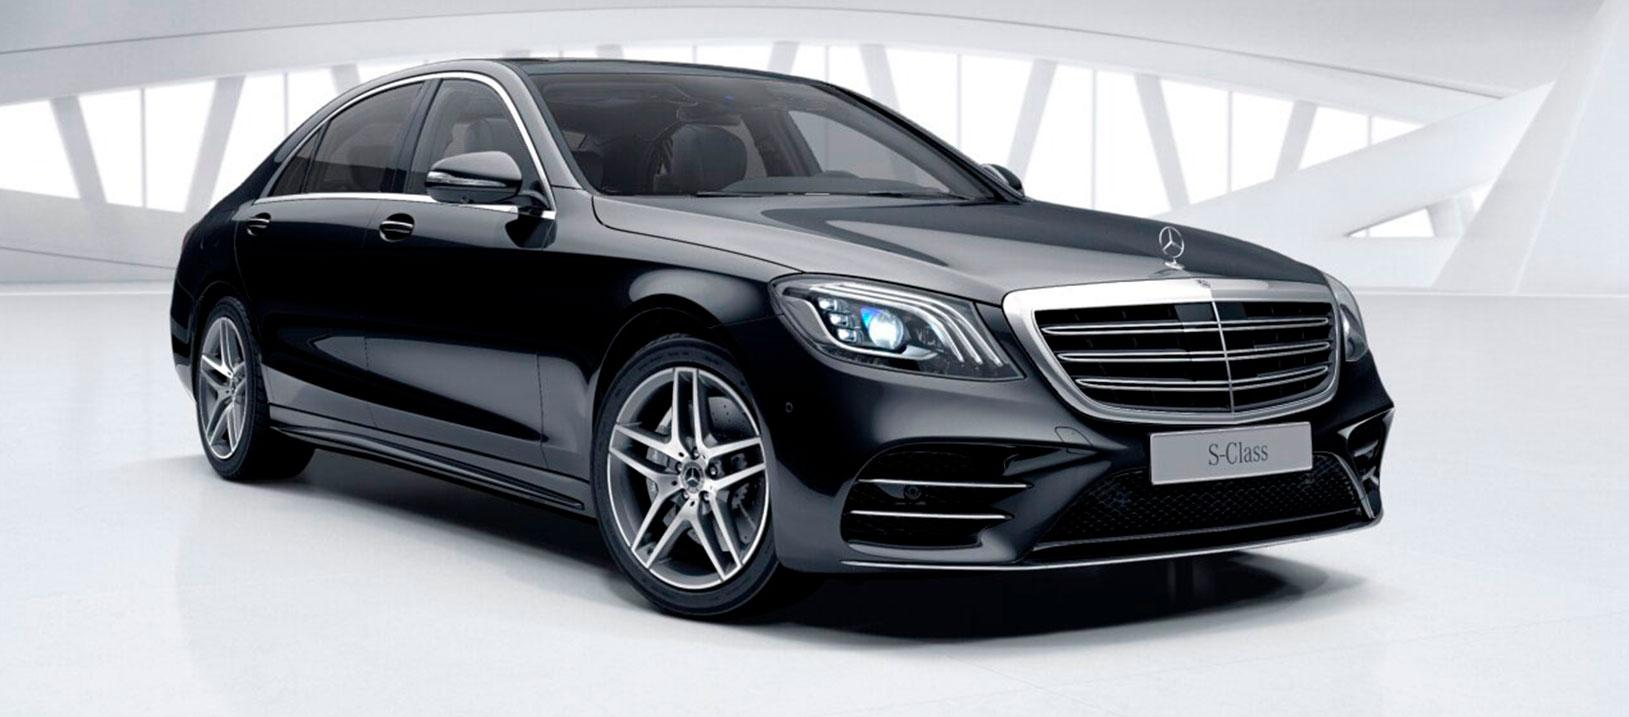 Mercedes-Benz S 400 d 4MATIC long 52600208